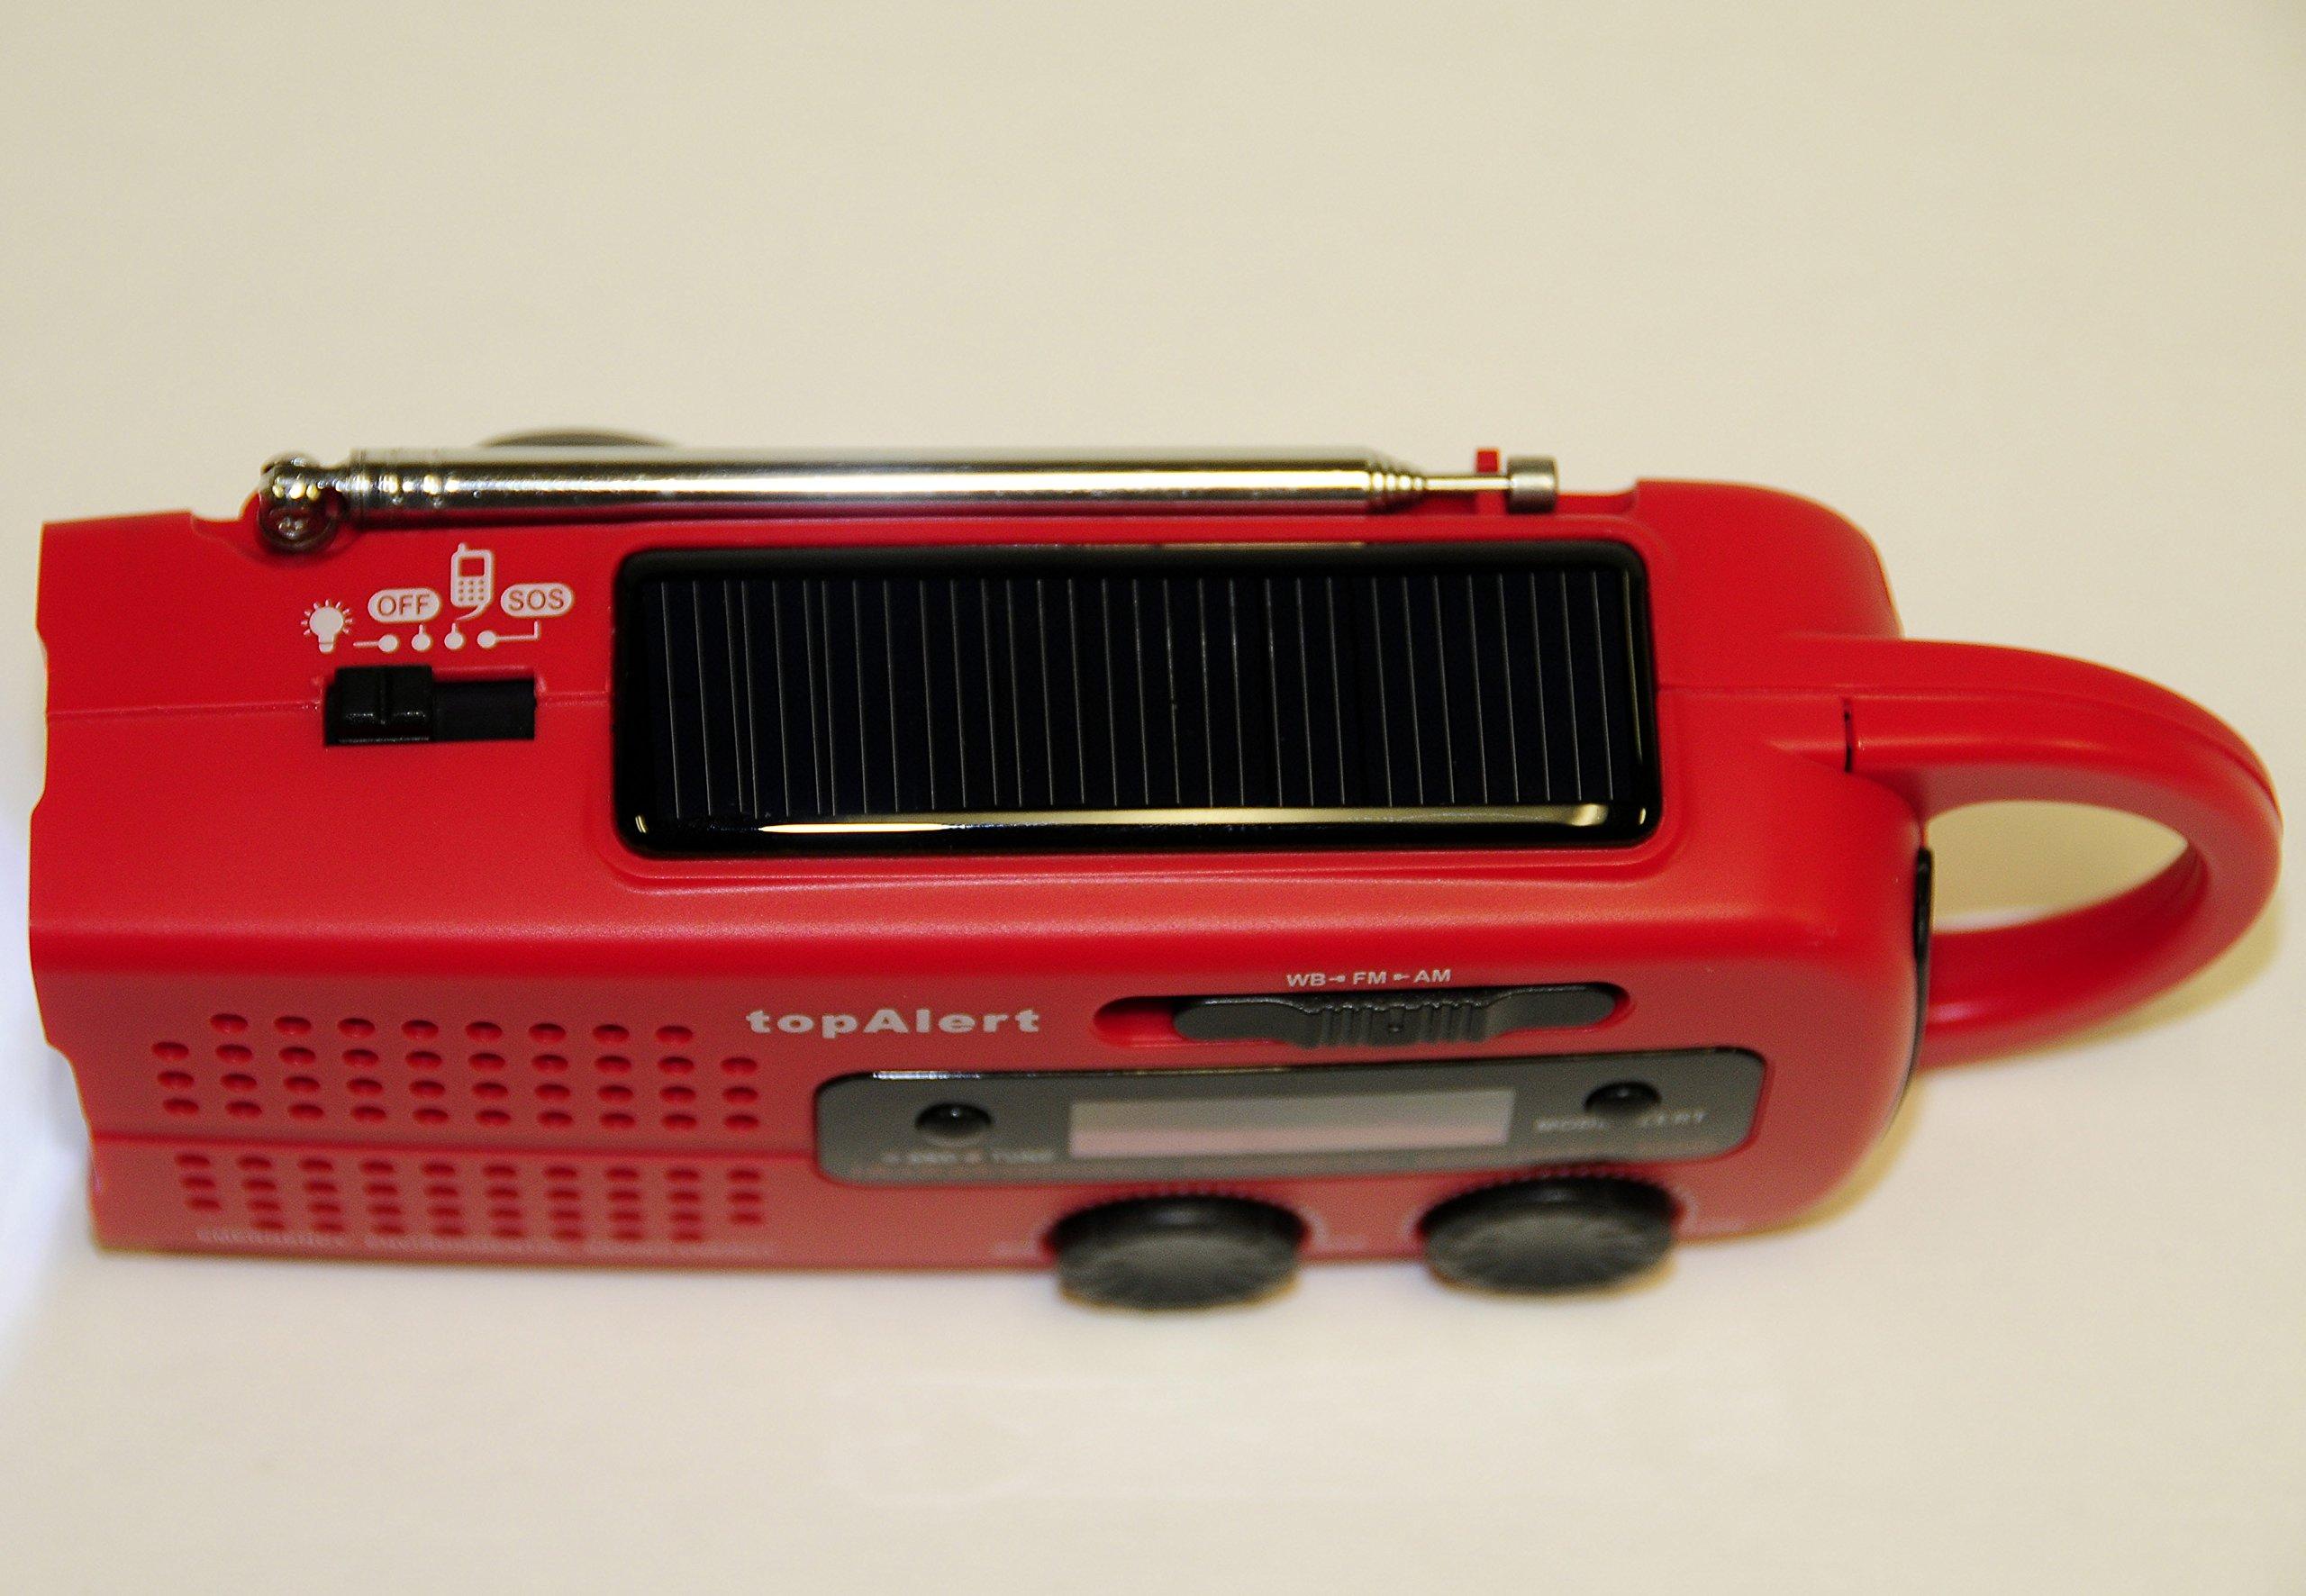 topAlert MD-019 Emergency Solar Hand Crank Weather Alert Radio